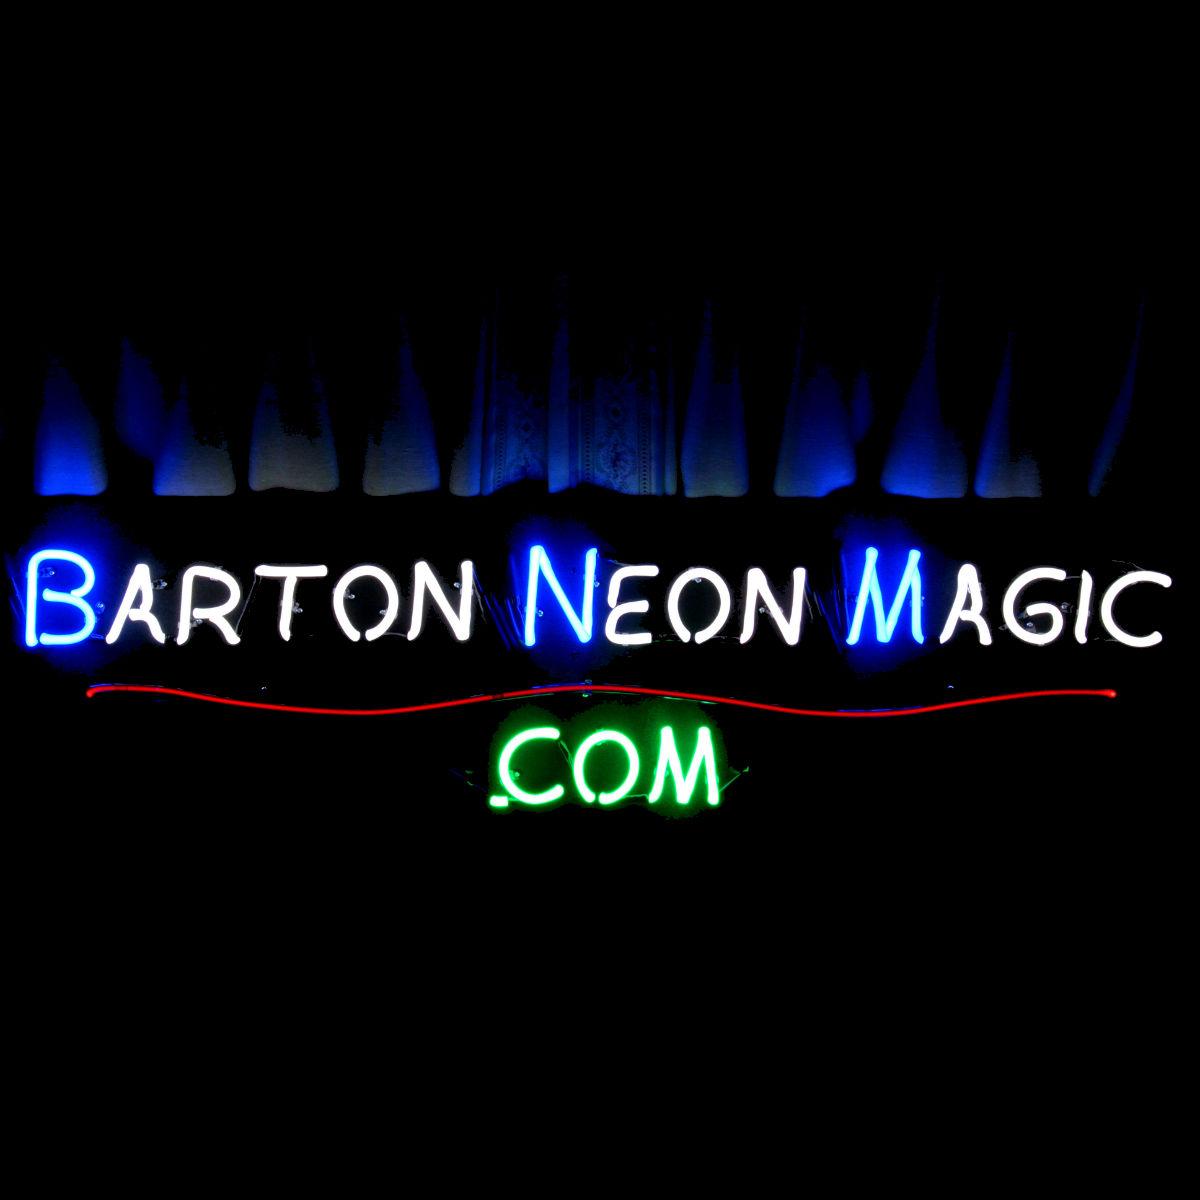 Fine Designer Neon Artworks by John Barton - Famous USA Neon Glass Artist - BartonNeonMagic.com